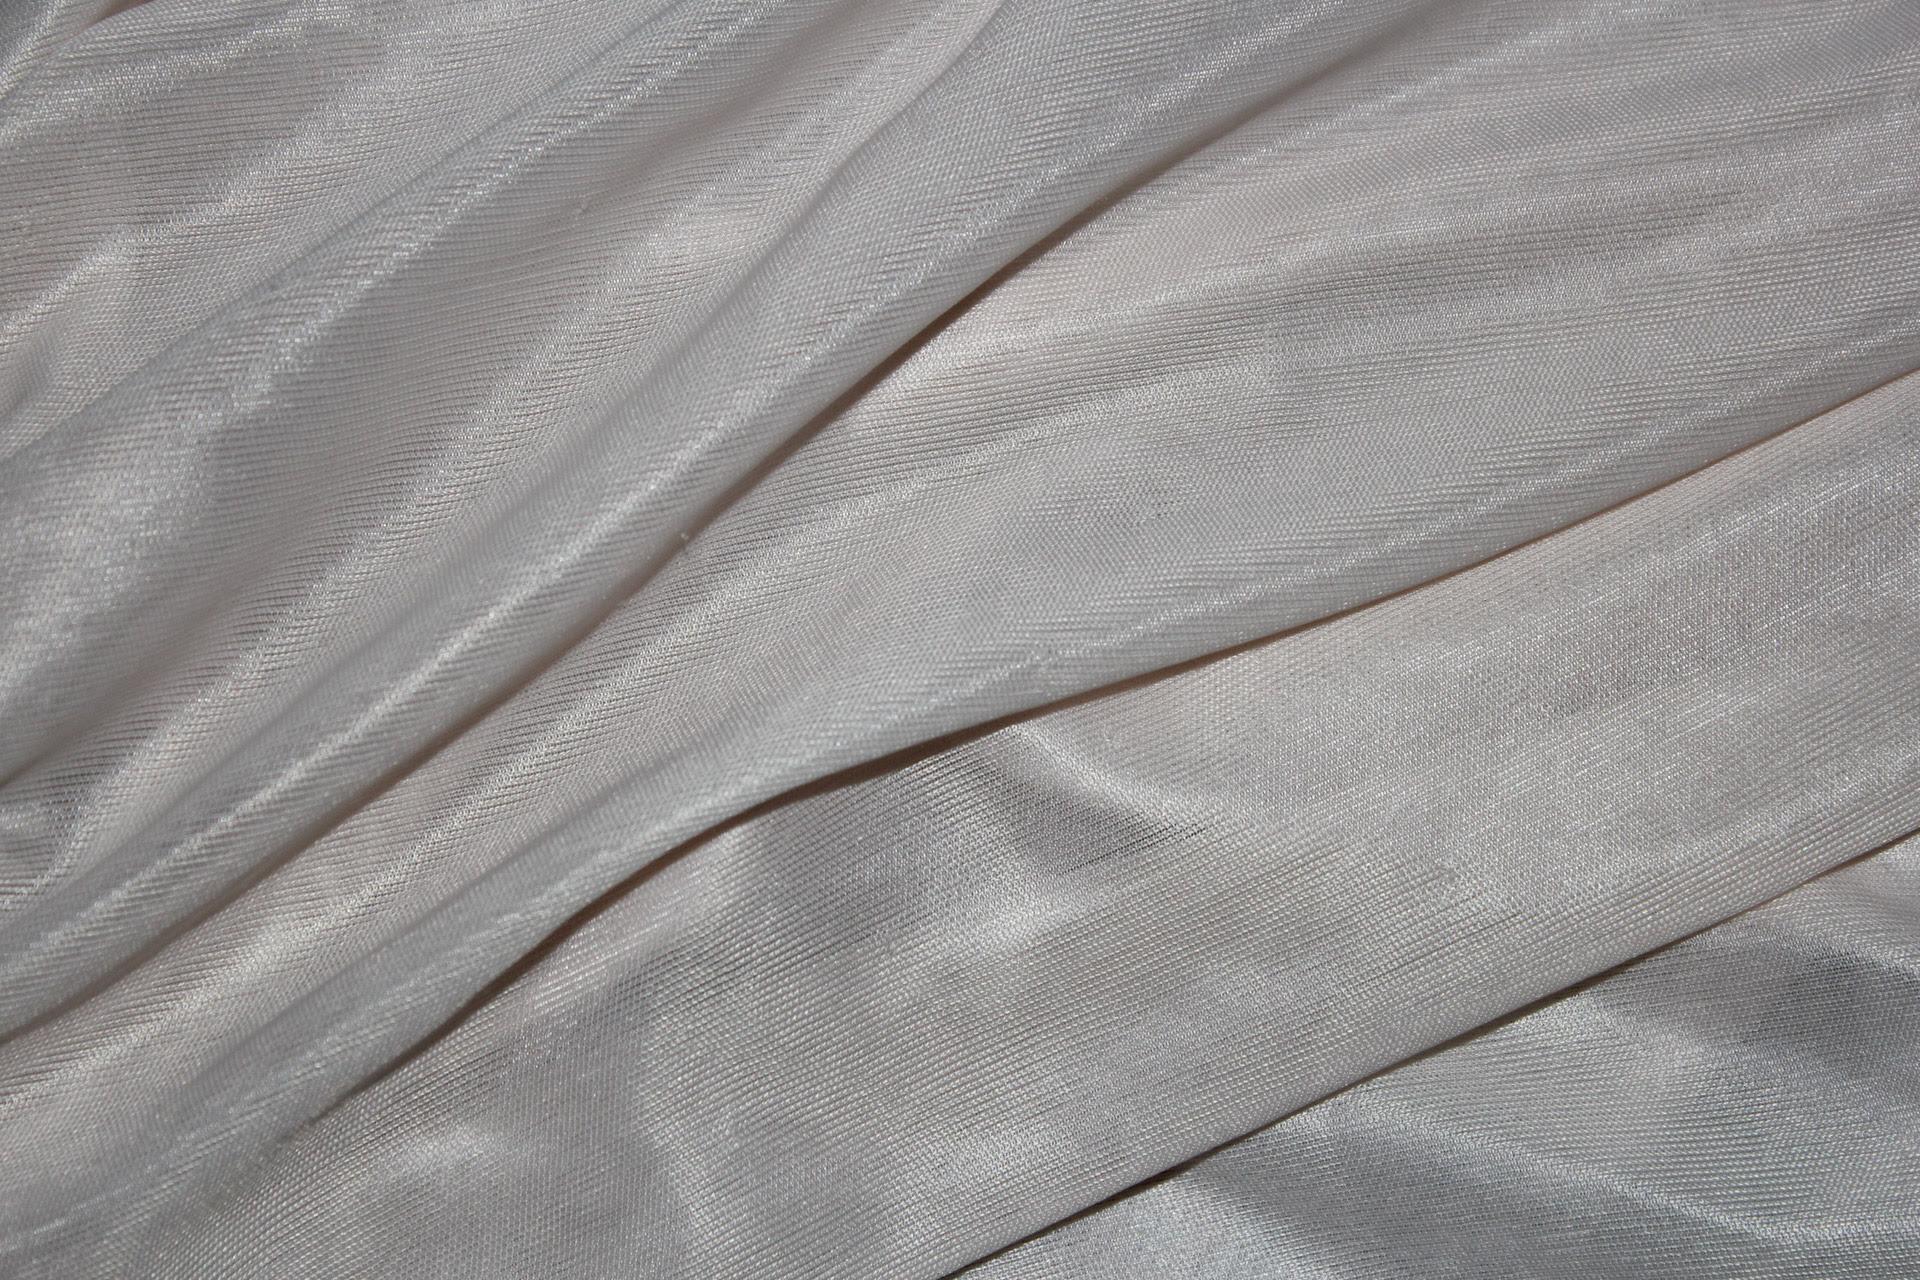 Silk Gray Background 2 Free Stock Photo - Public Domain ...